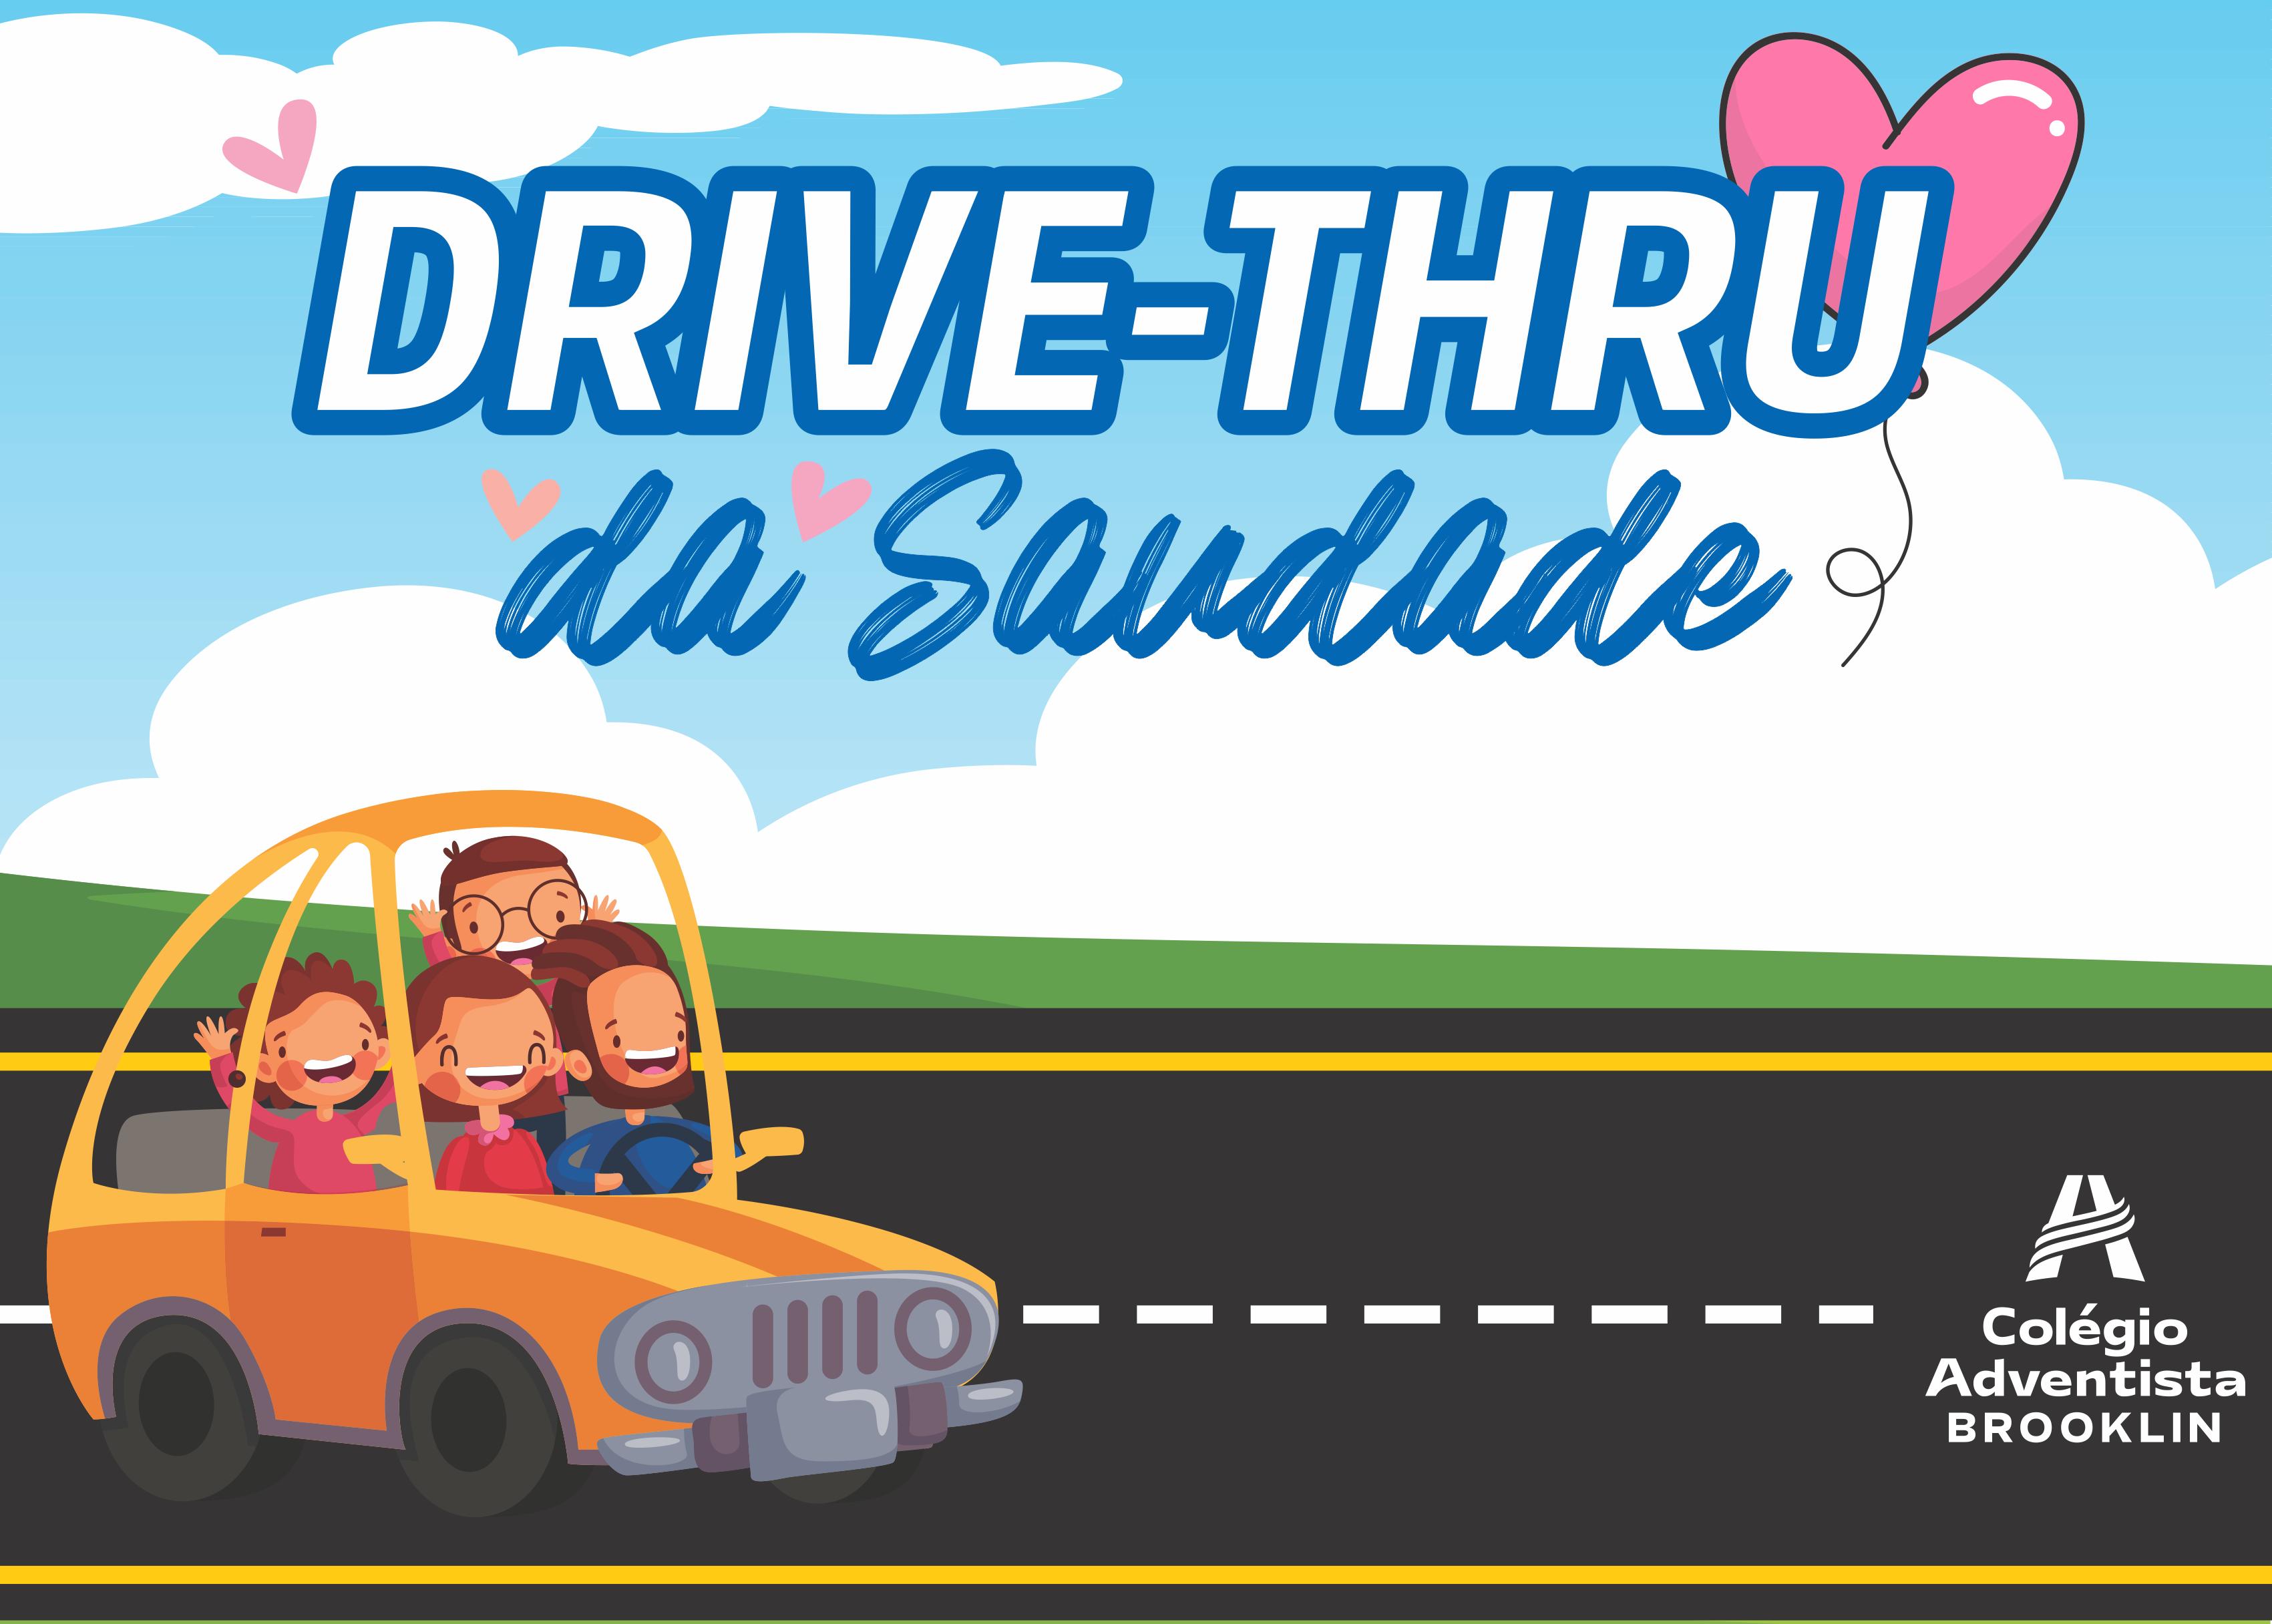 Drive-Thru da Saudade